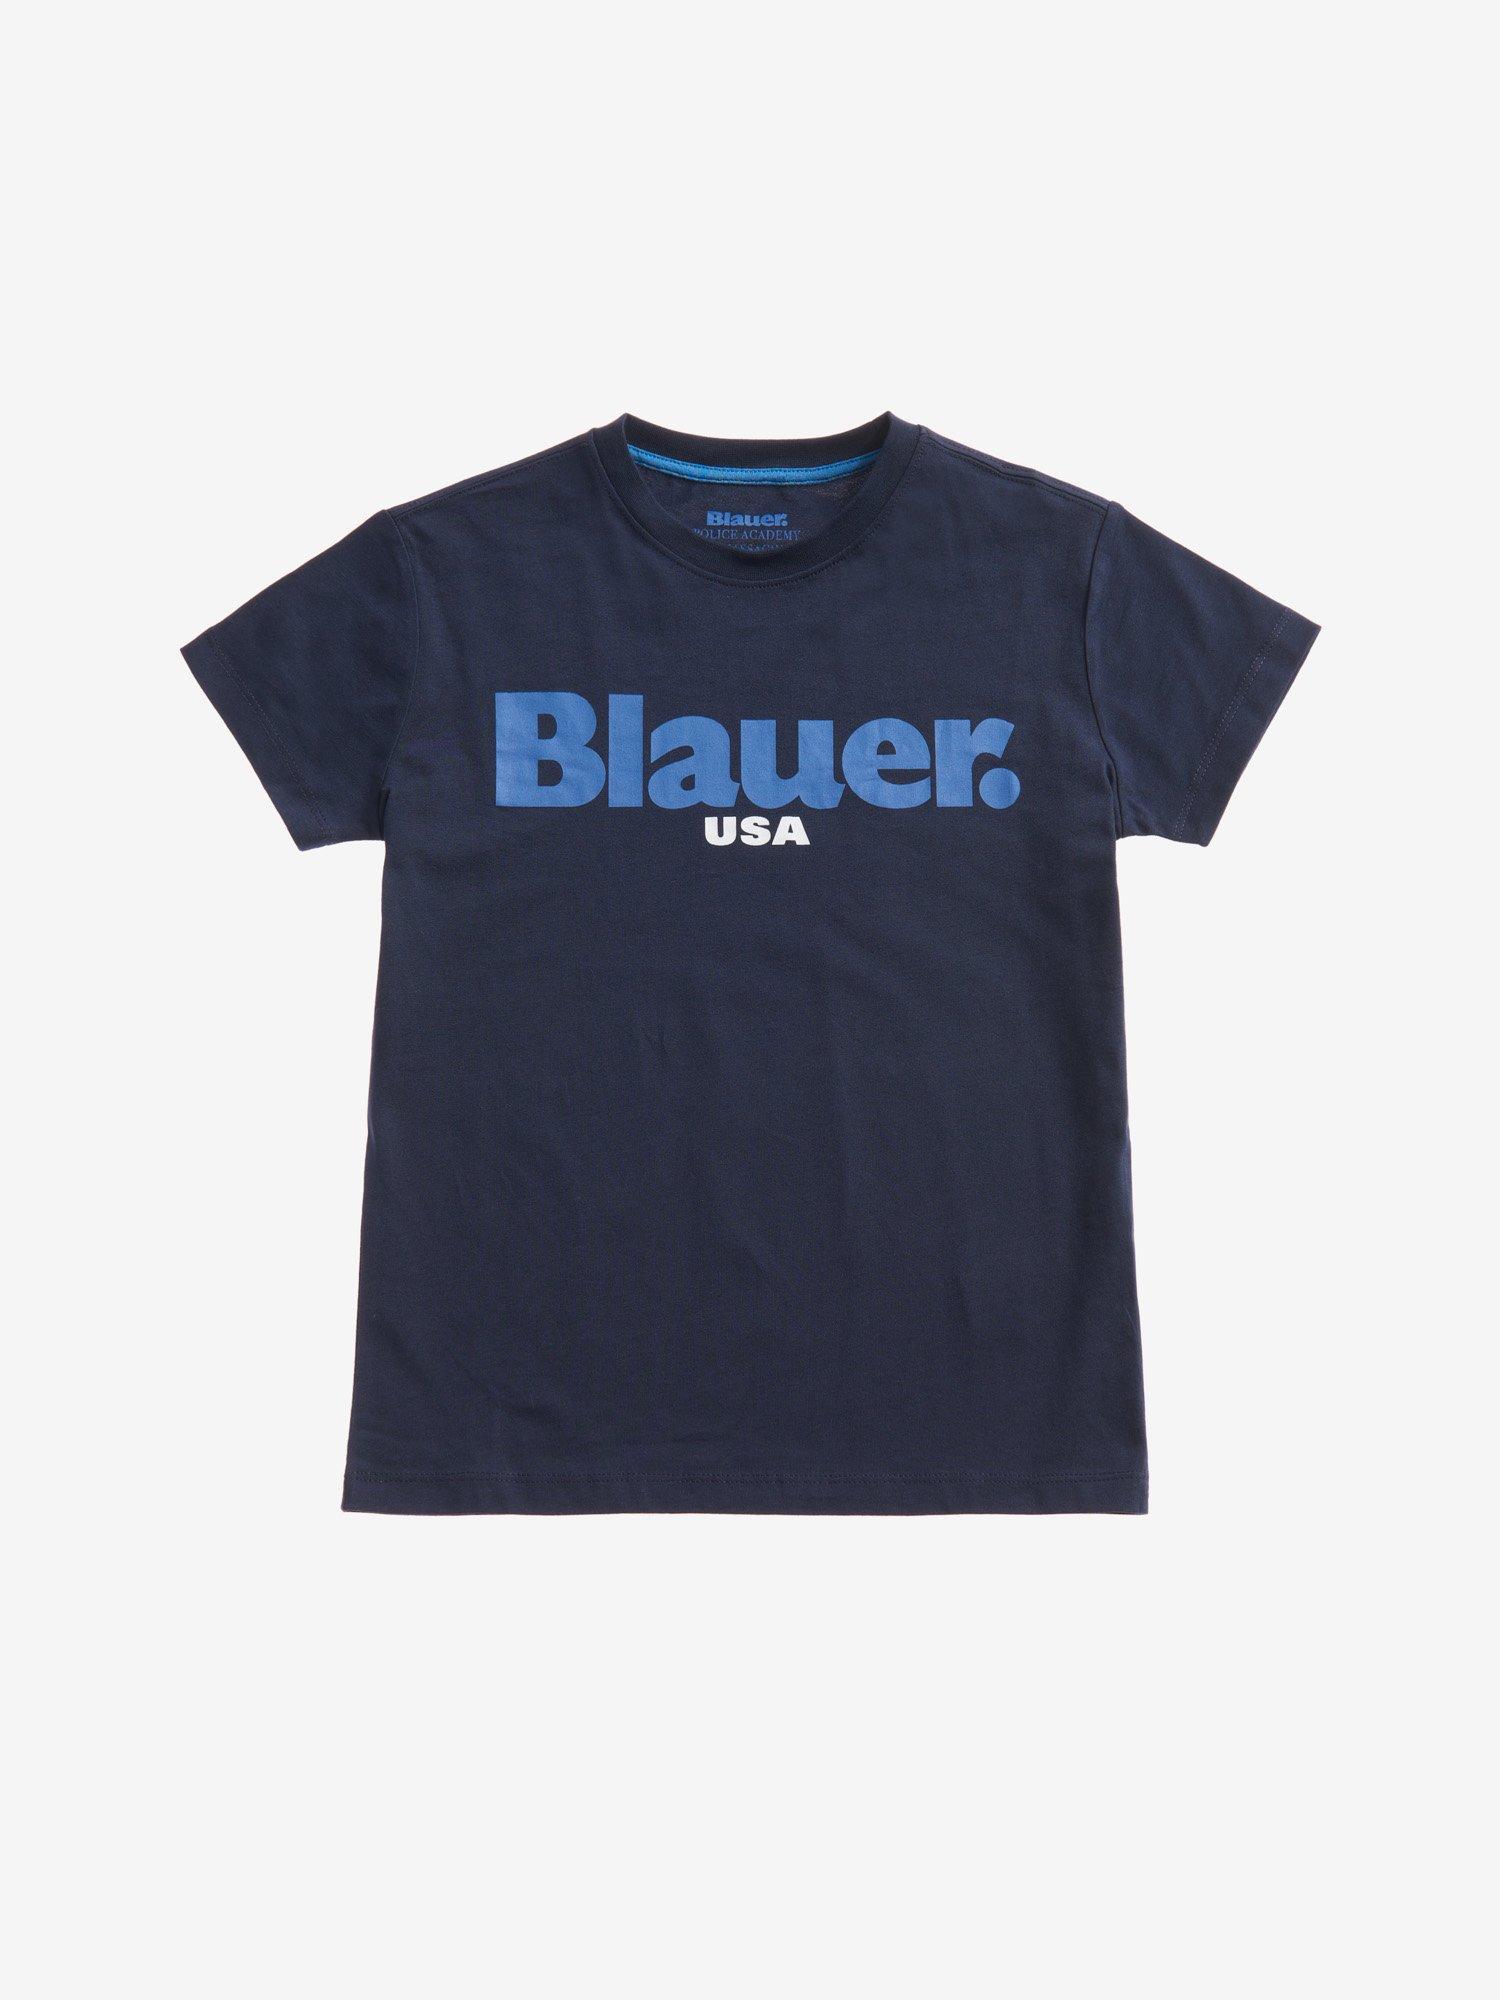 Blauer - T-SHIRT POUR GARÇON BLAUER USA - Dark Sapphire - Blauer